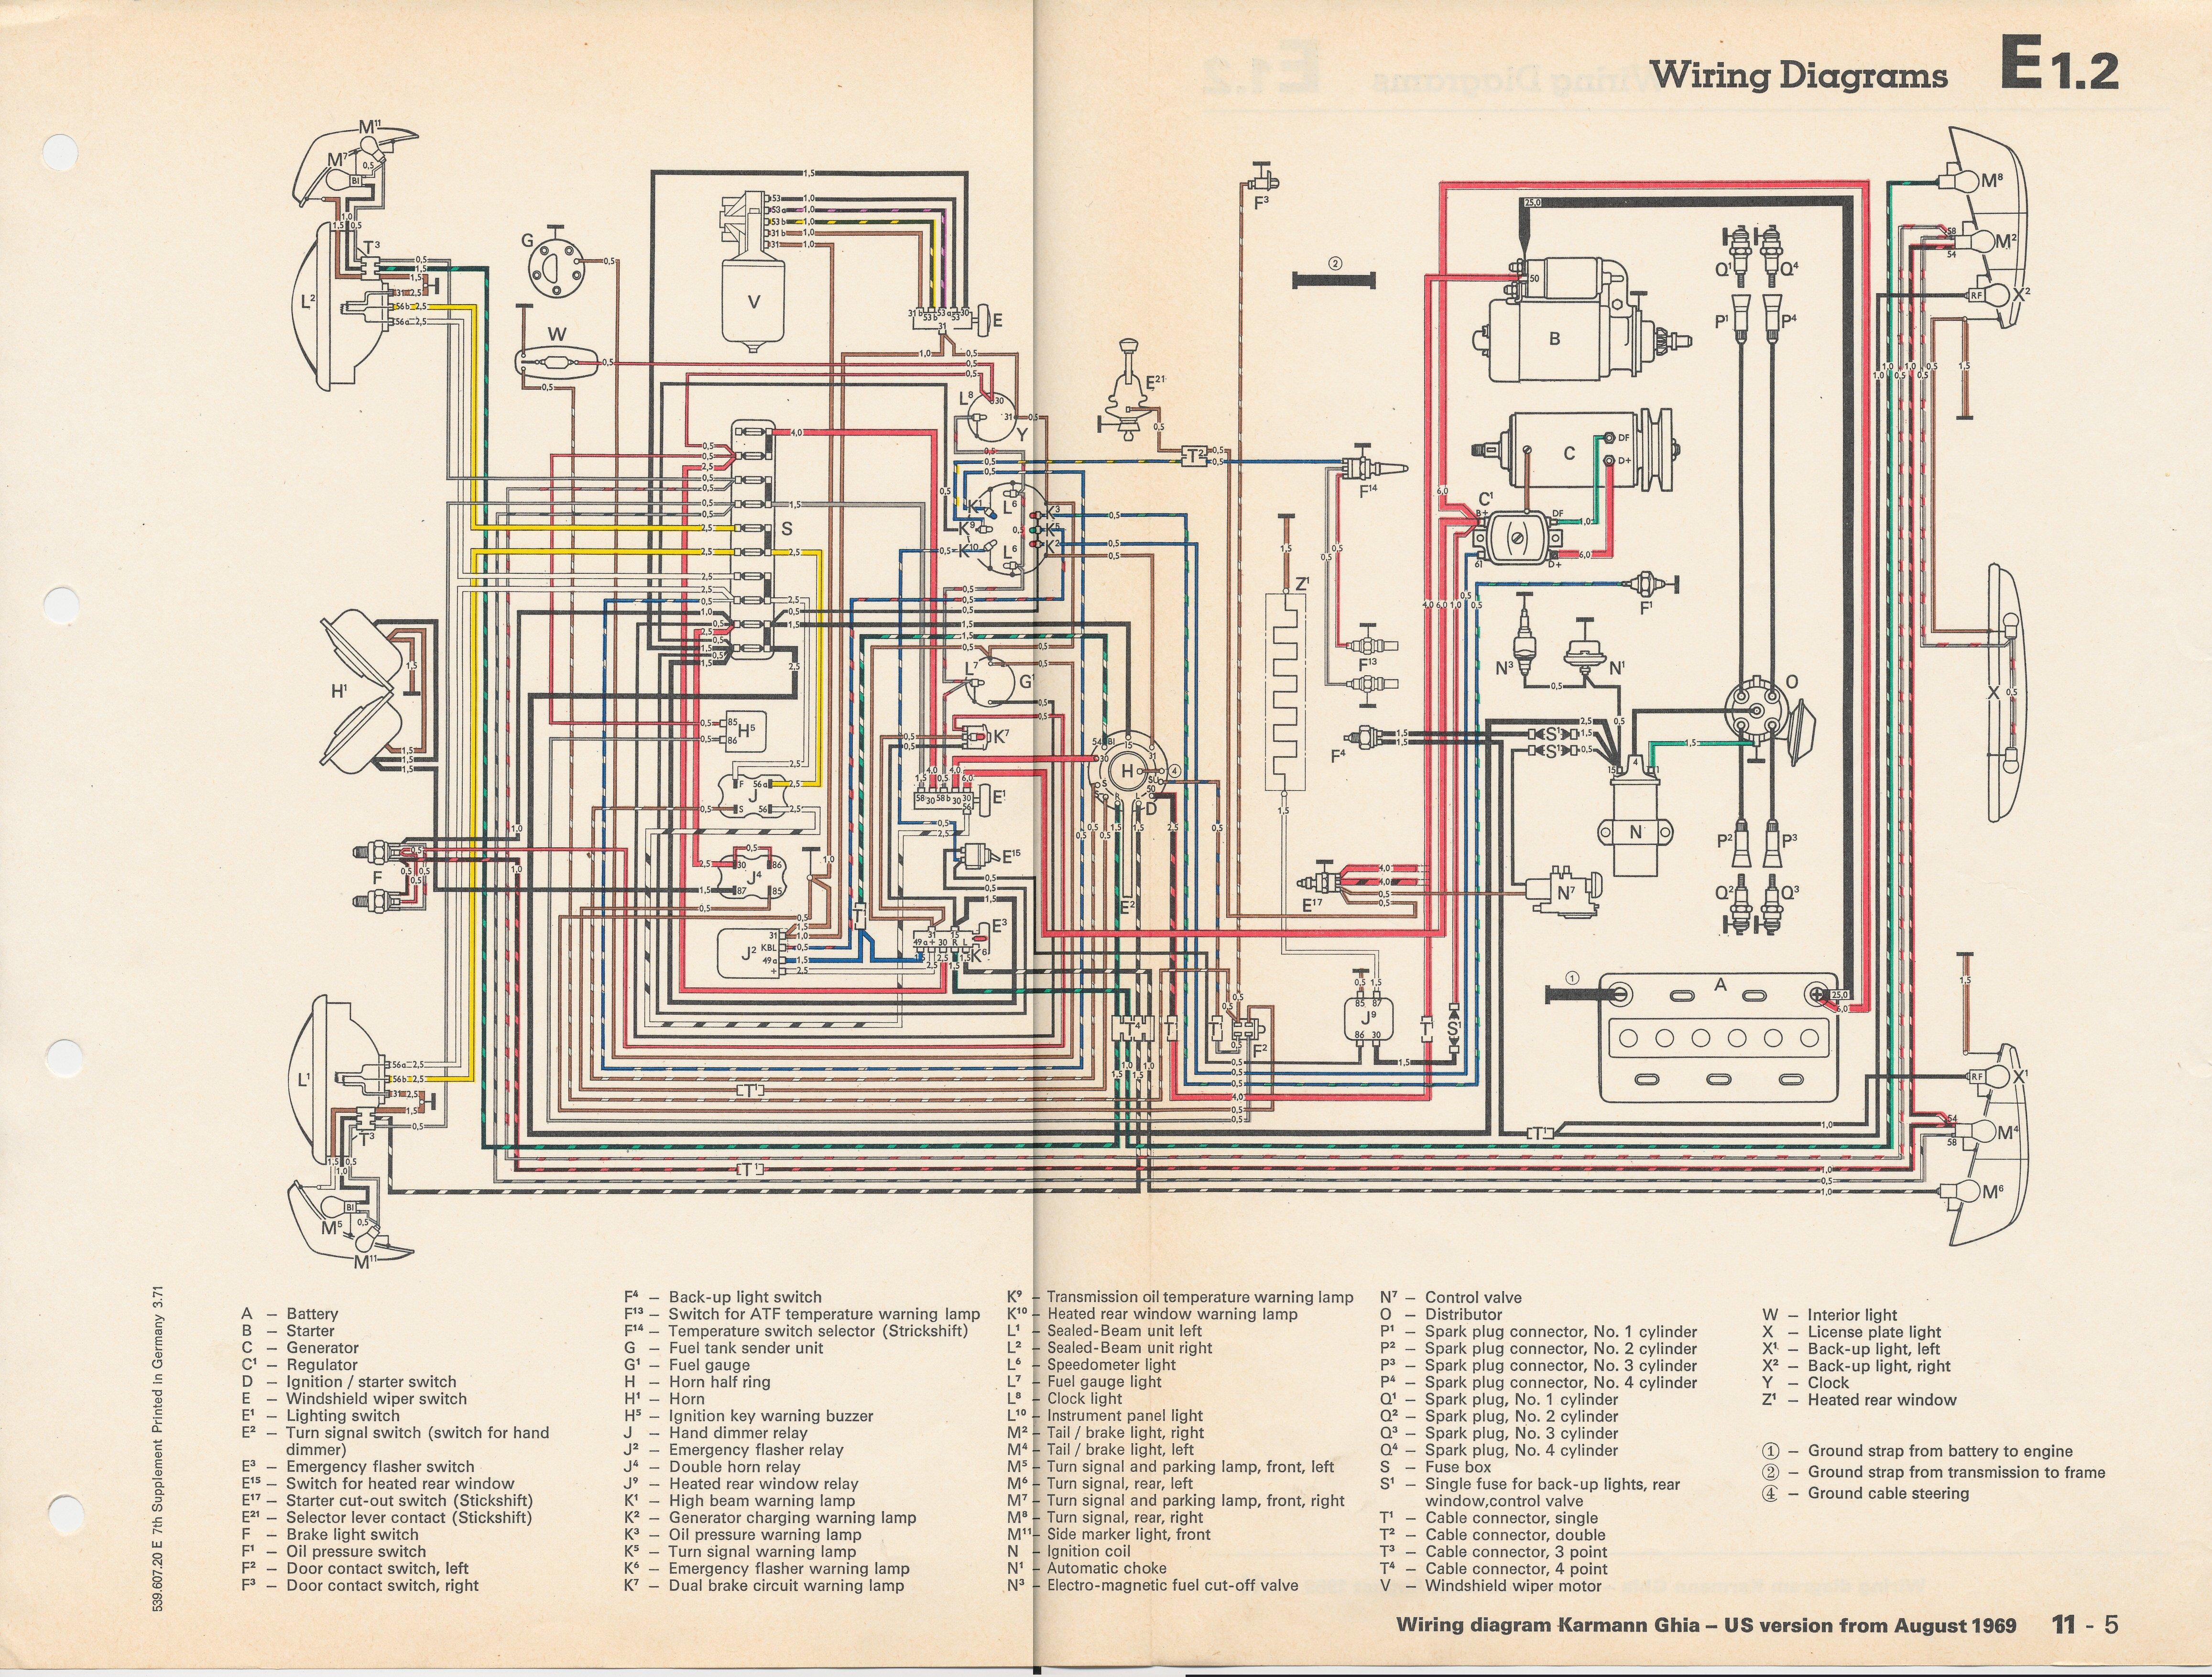 1966 Bug Wiring Diagram Schematic Thesamba Com Karmann Ghia Wiring Diagrams